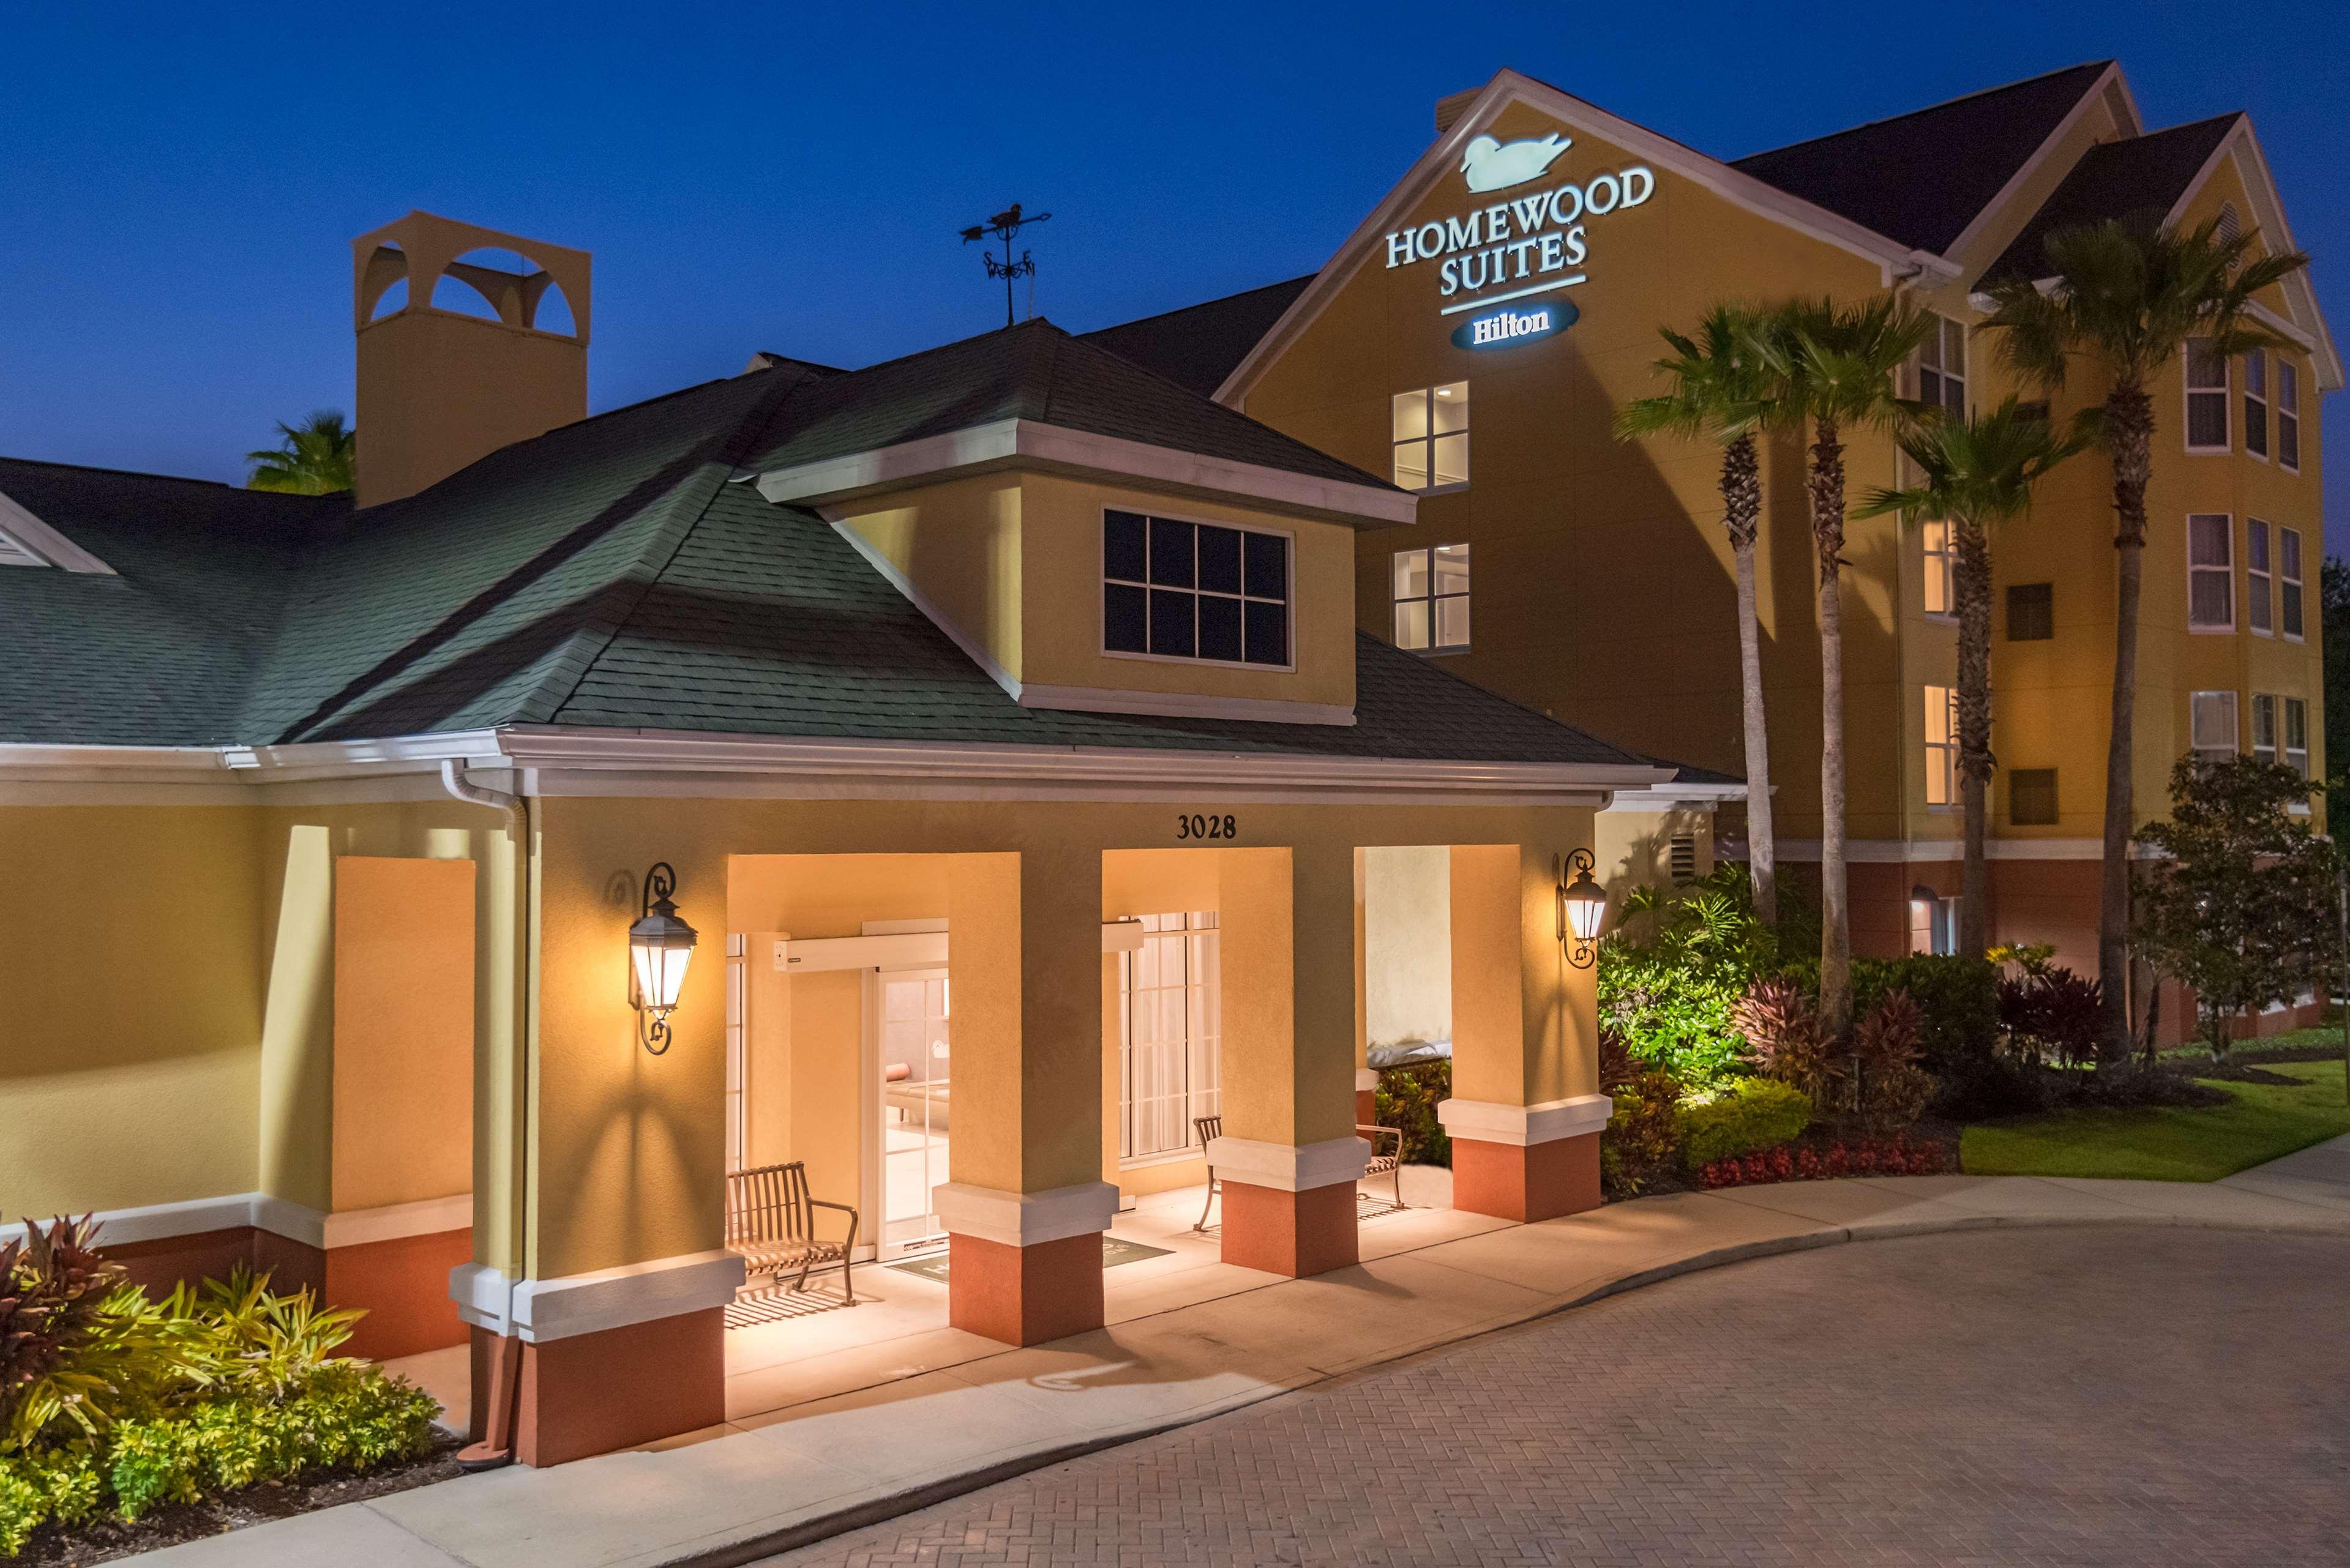 Homewood Suites by Hilton Orlando-UCF Area image 1